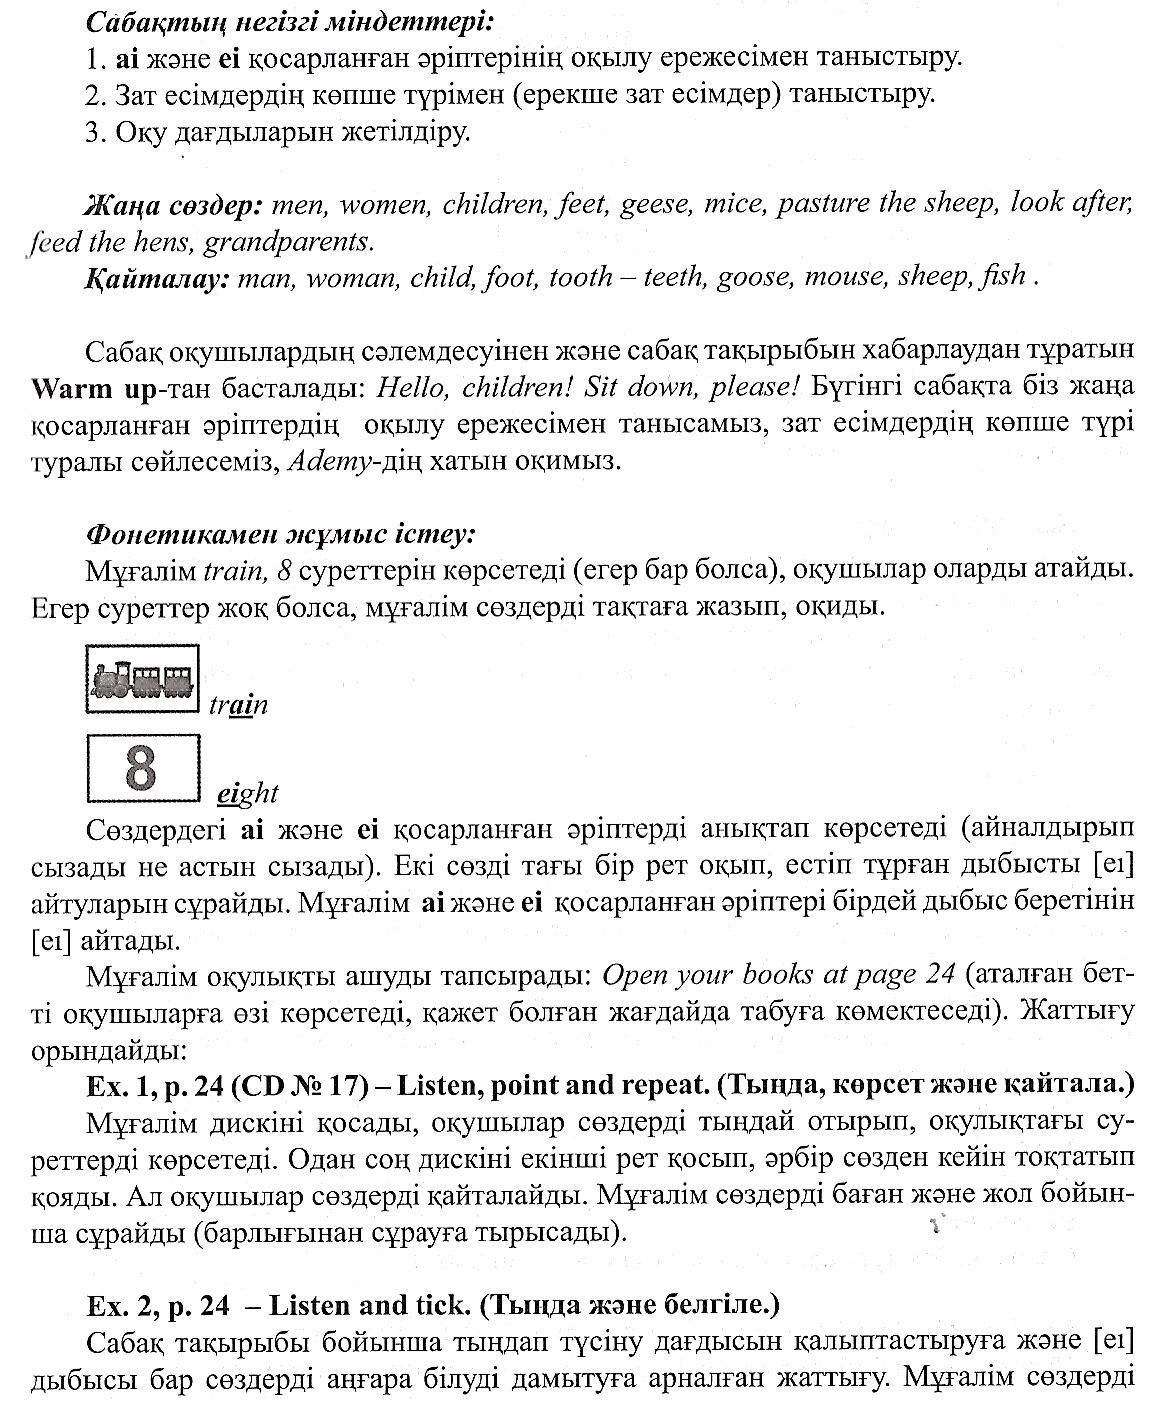 C:\Documents and Settings\User\Local Settings\Temporary Internet Files\Content.Word\сканирование0012.jpg